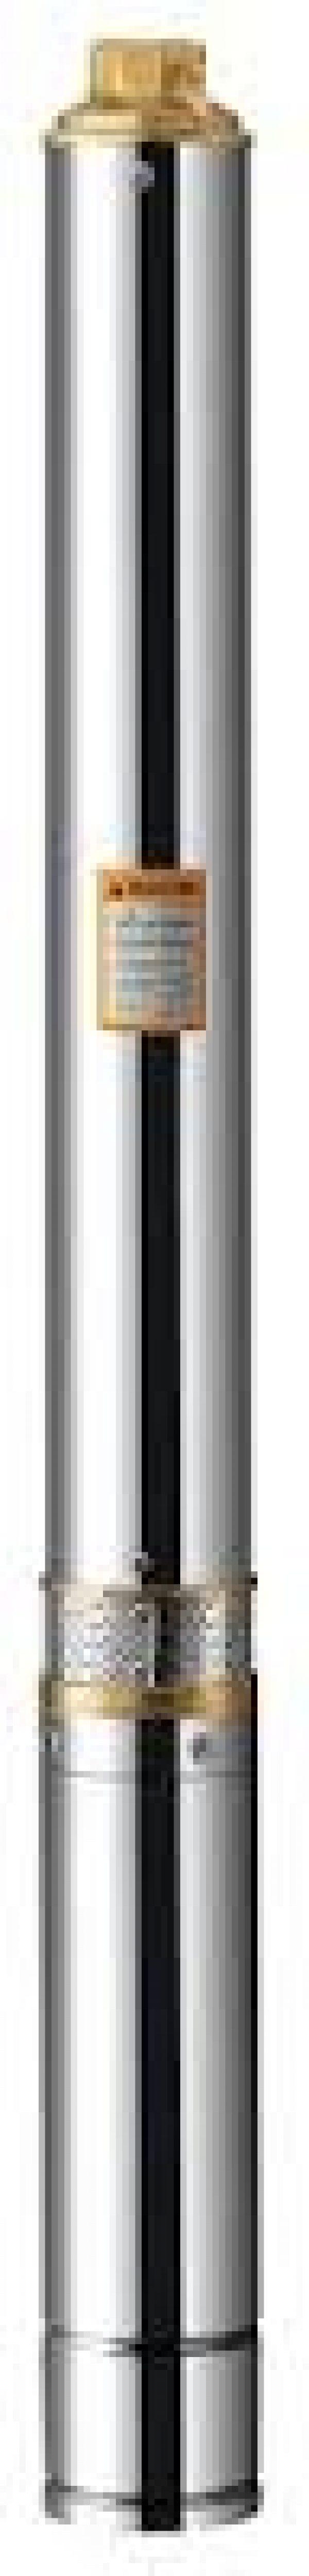 Electrobomba Sumergible Pozo Profundo 8 Impulsores Shimge